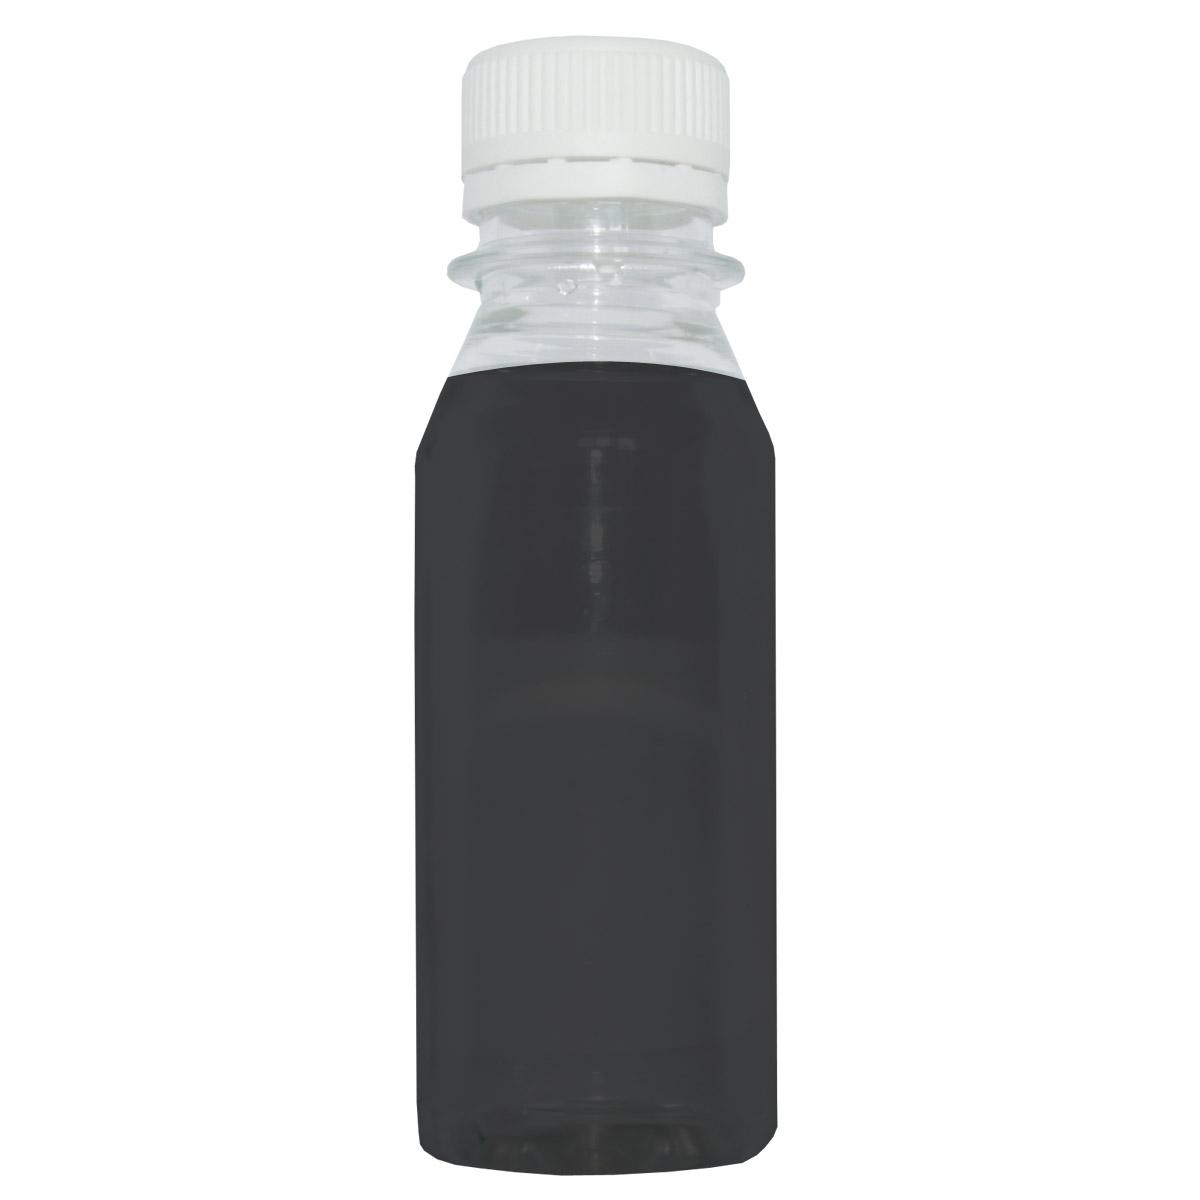 Epson Ink L 310 Brand Ocp Manufacturers Symbol Ij Bk 155 Printer L310 Black Dye 100 Ml